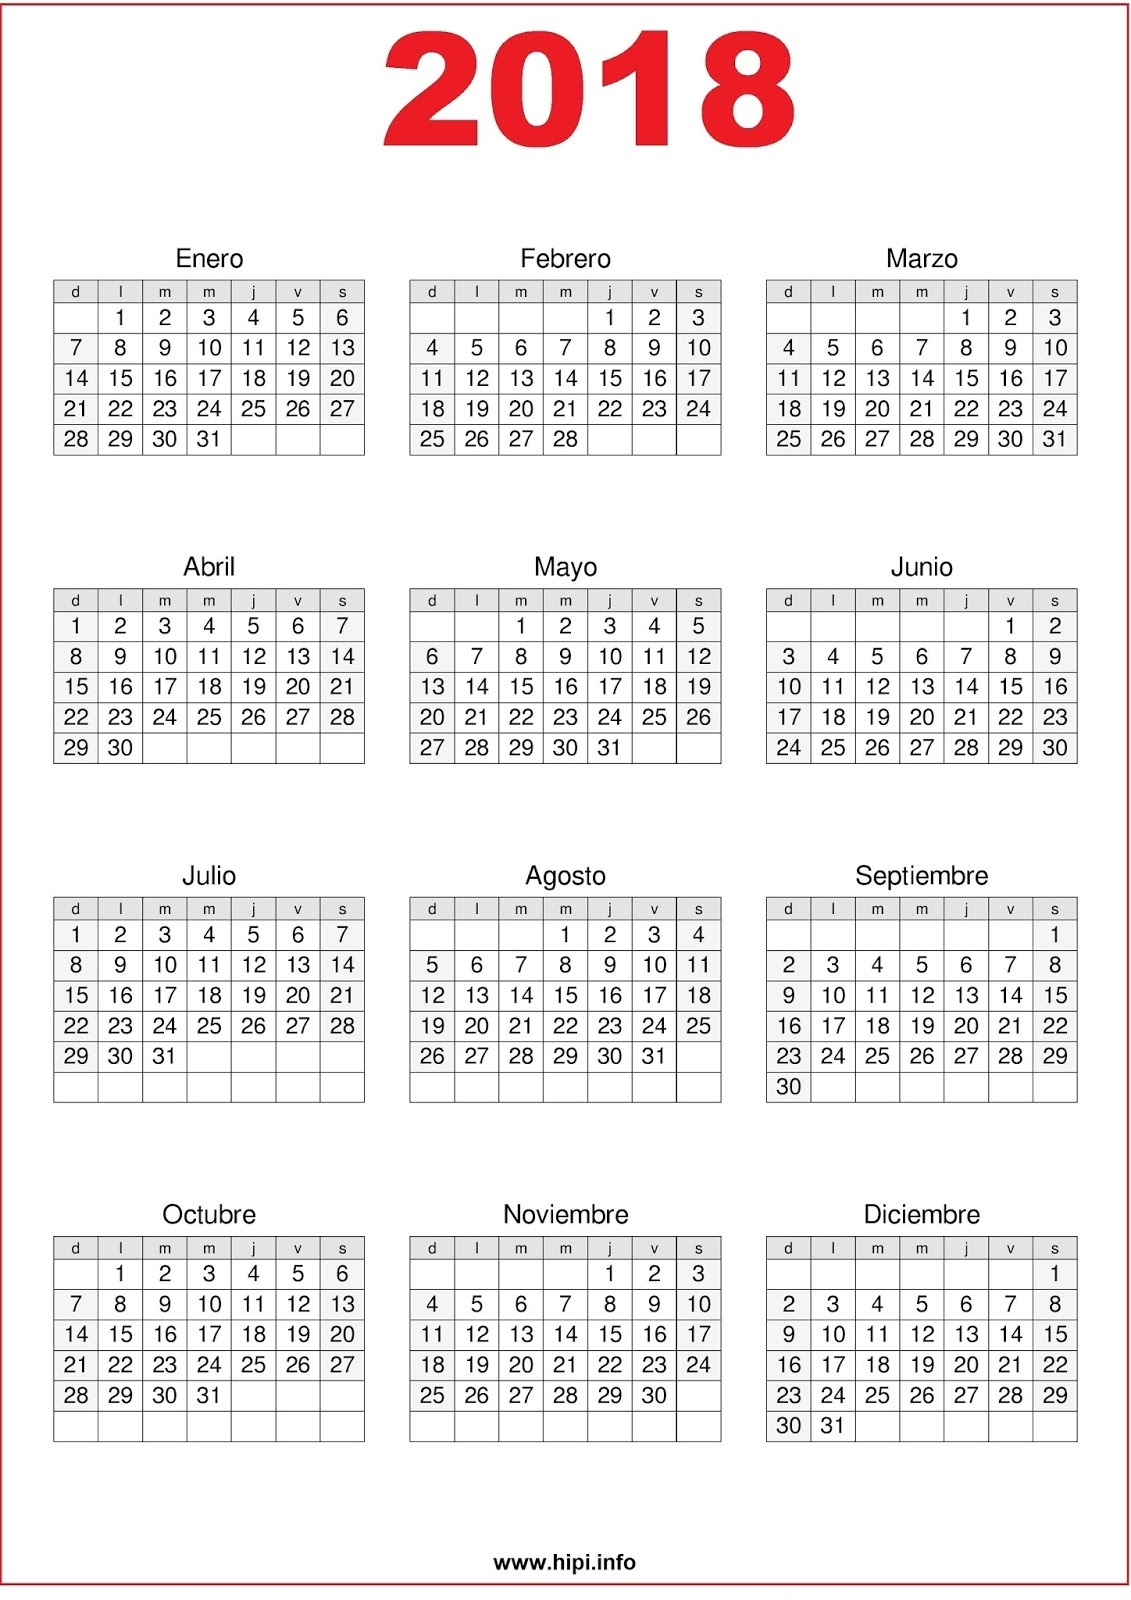 Twitter Headers / Facebook Covers / Wallpapers / Calendars: 2018